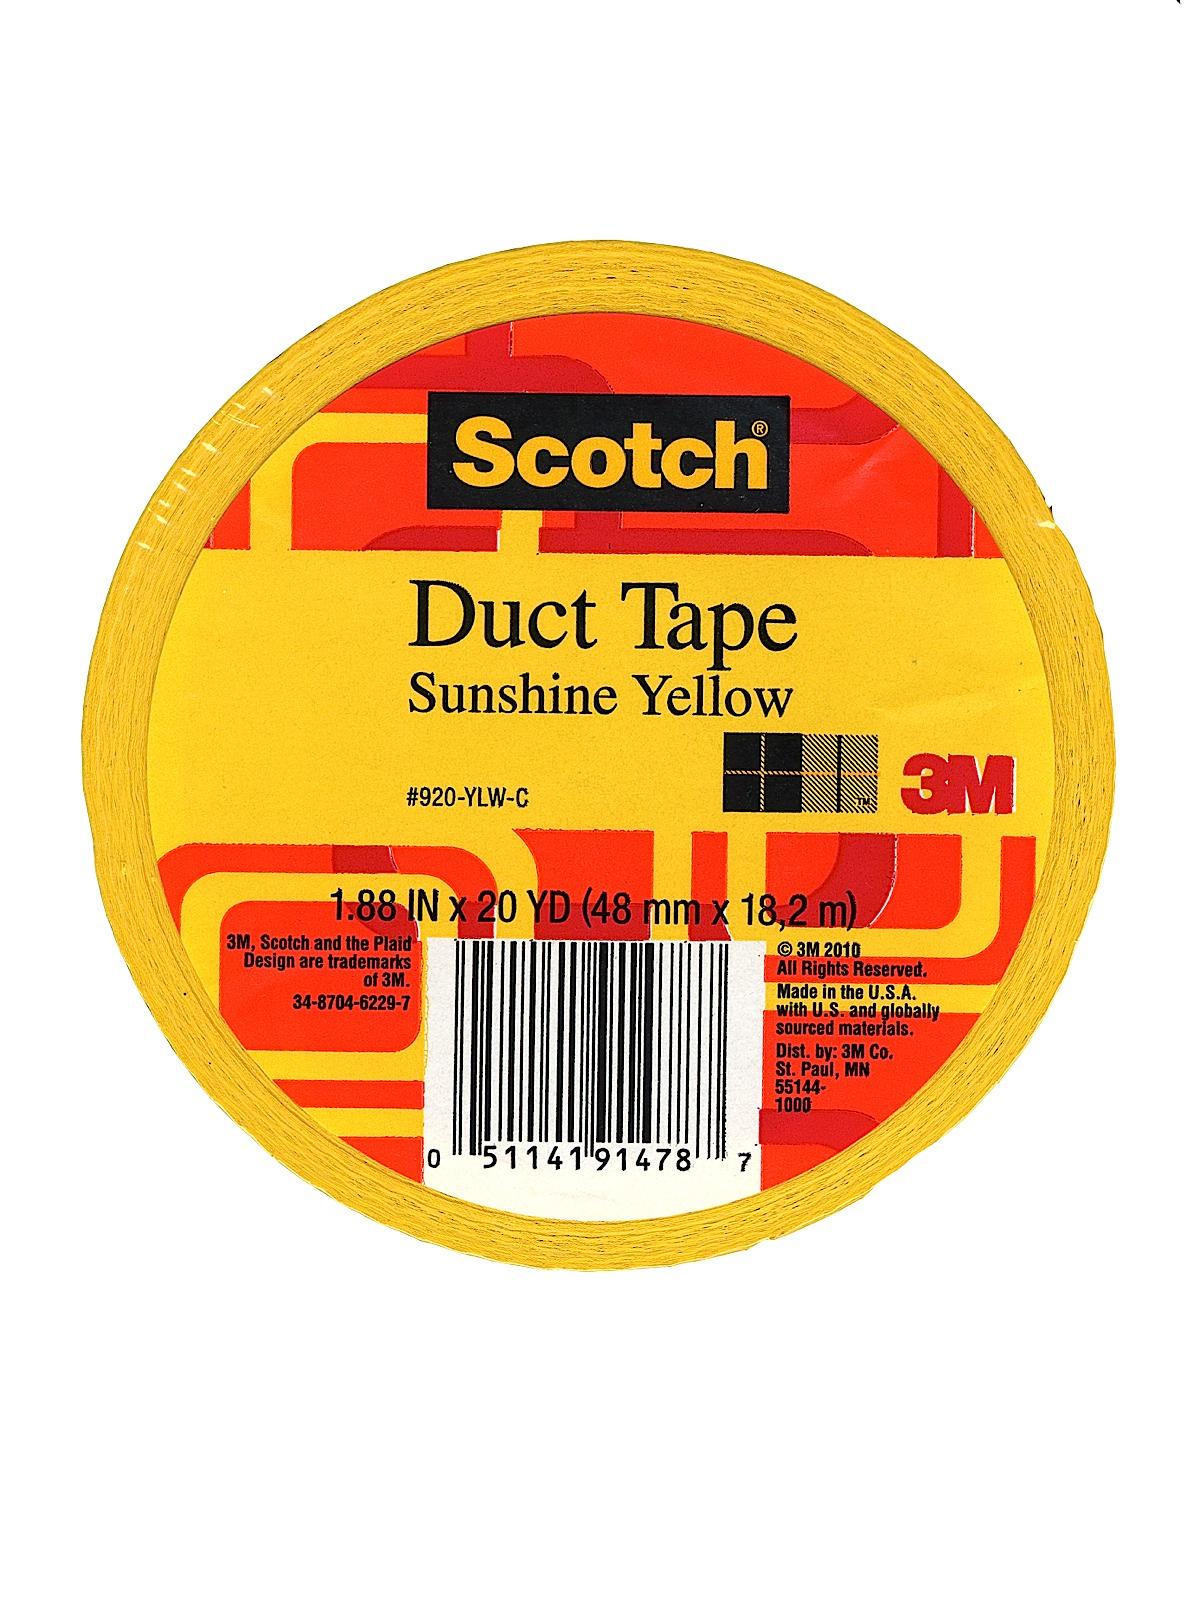 Scotch Colored Duct Tape Misterart Com